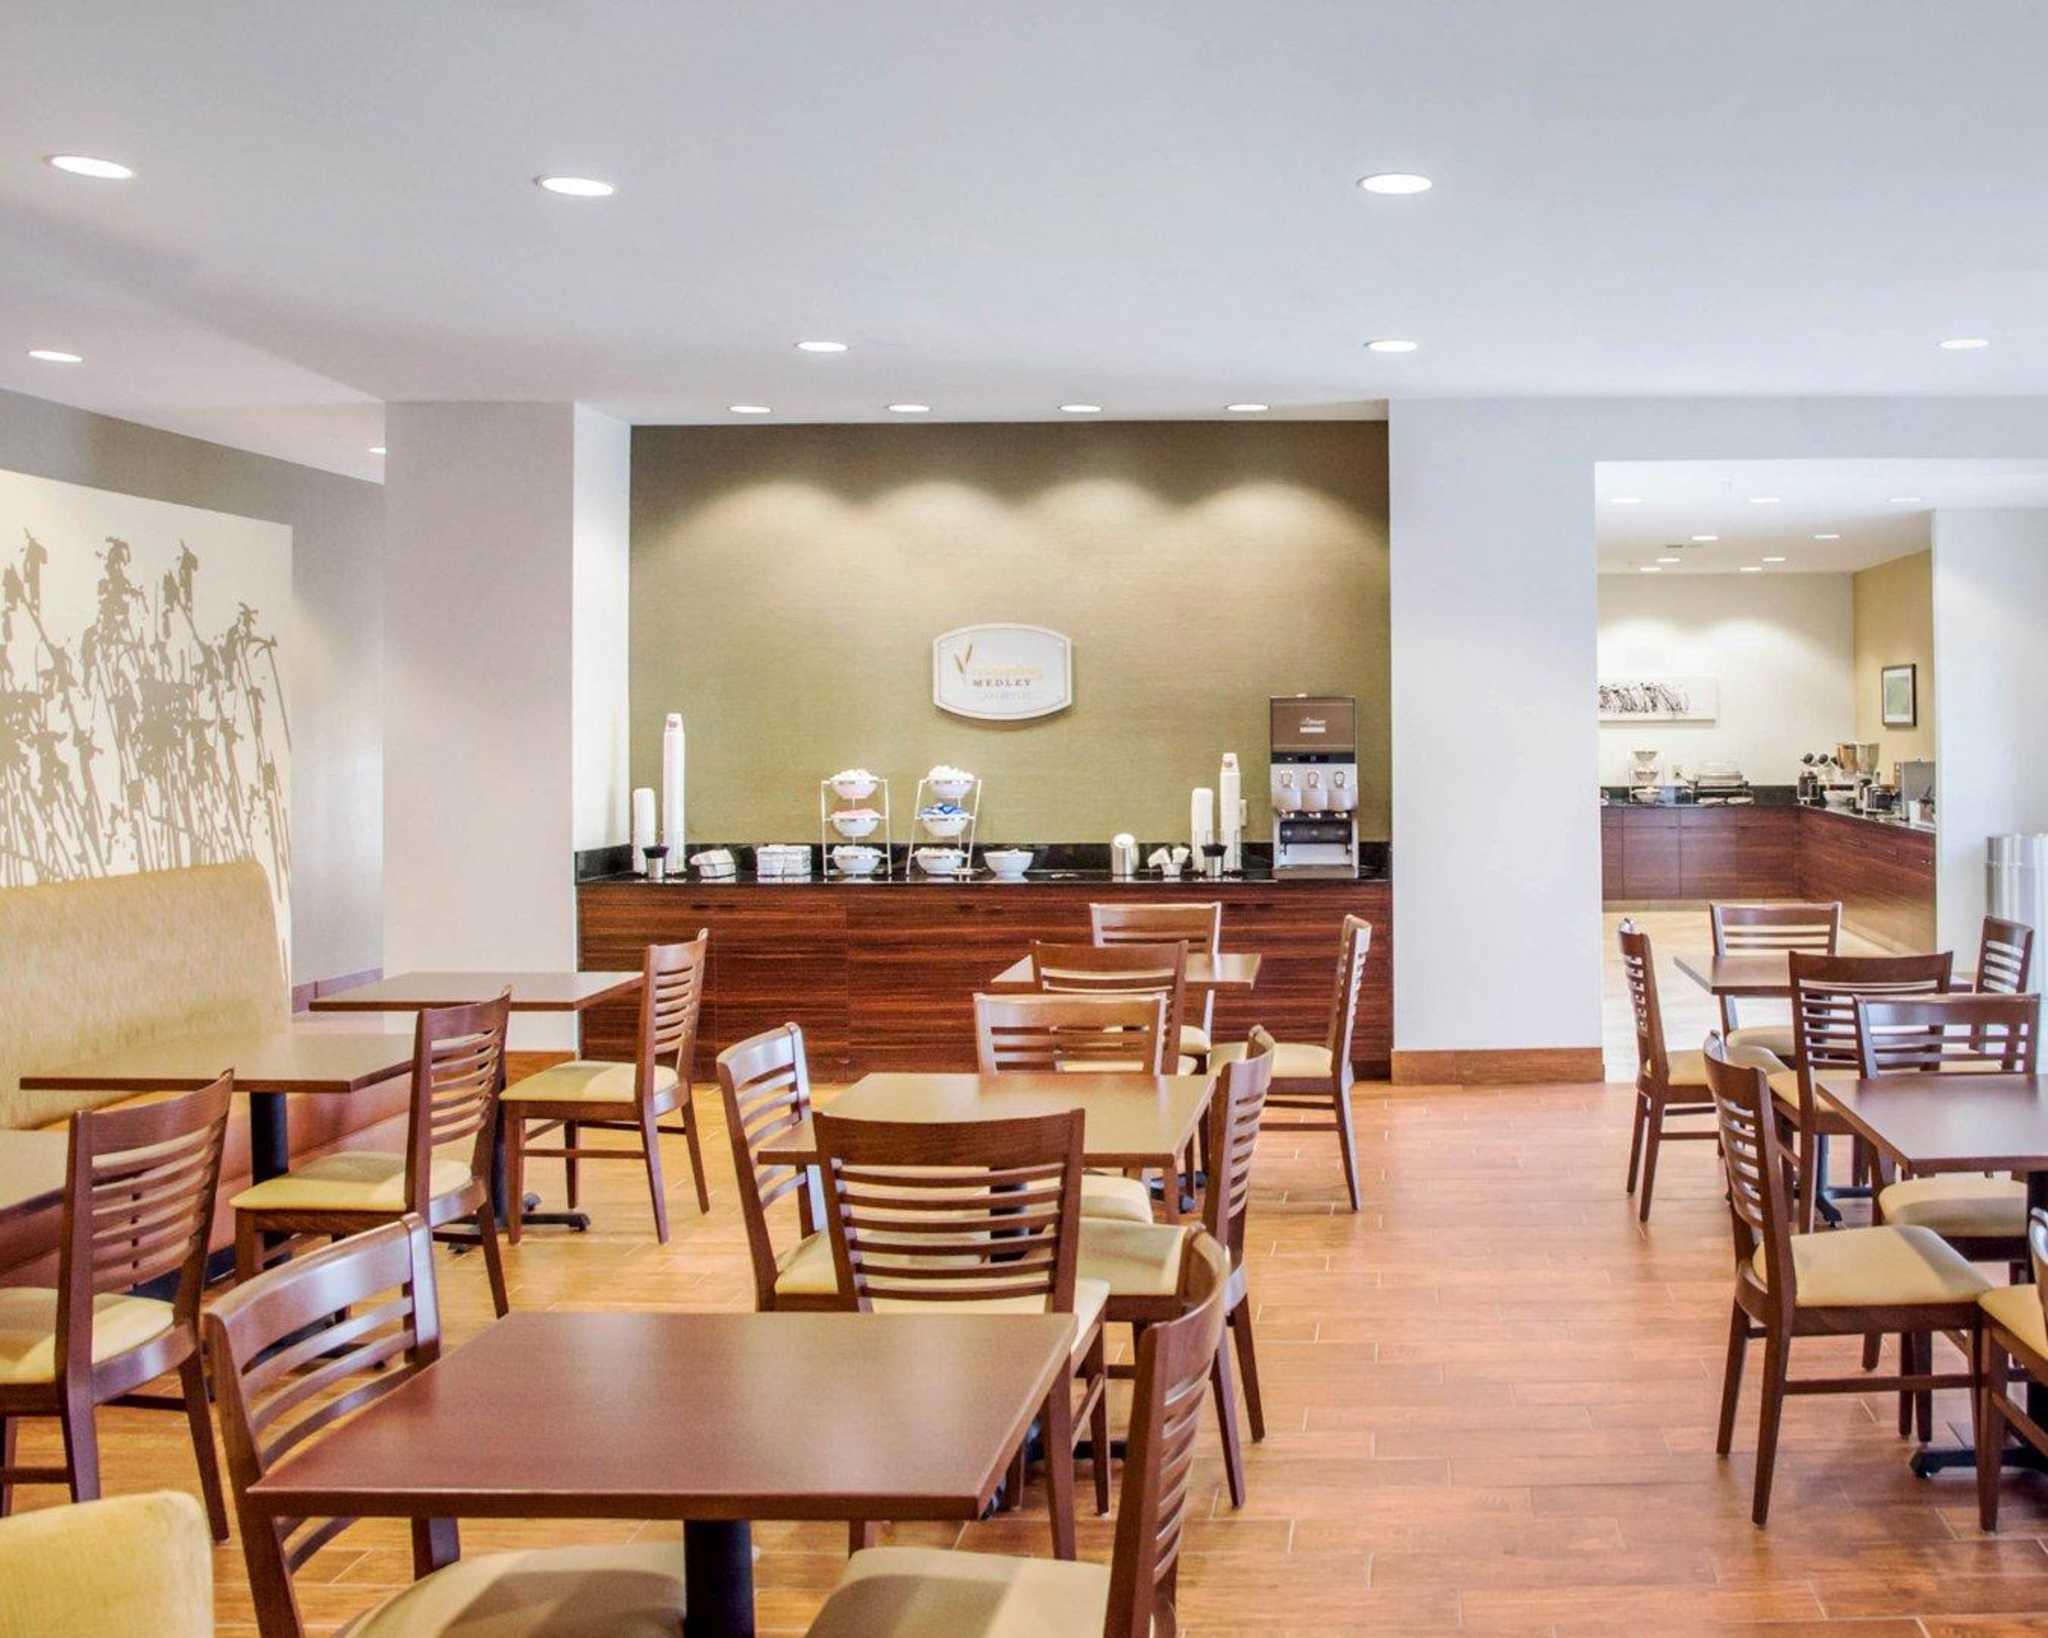 Sleep Inn & Suites Parkersburg-Marietta image 23